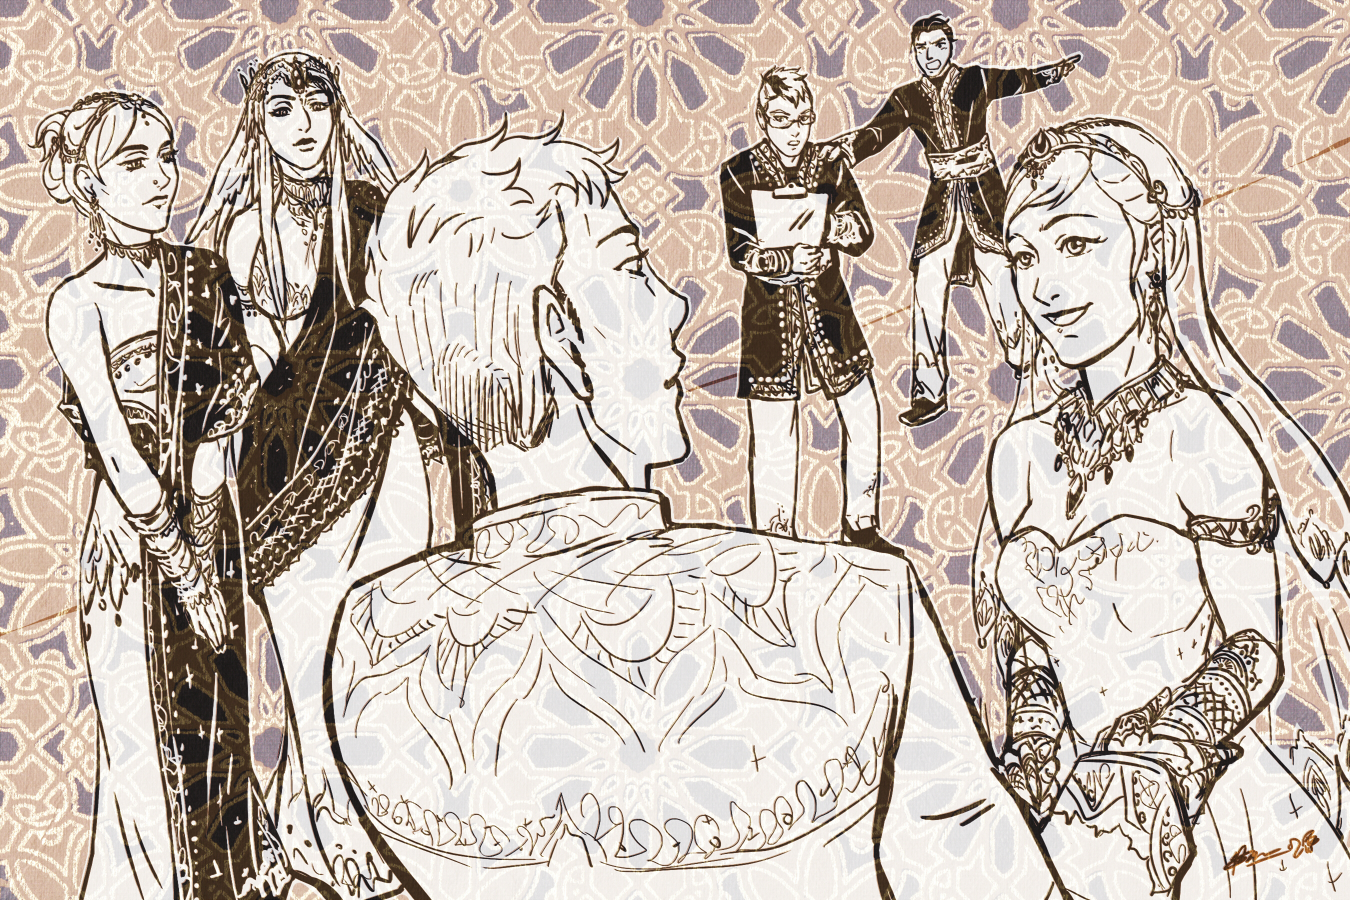 Wedding-ish! by Meibatsu